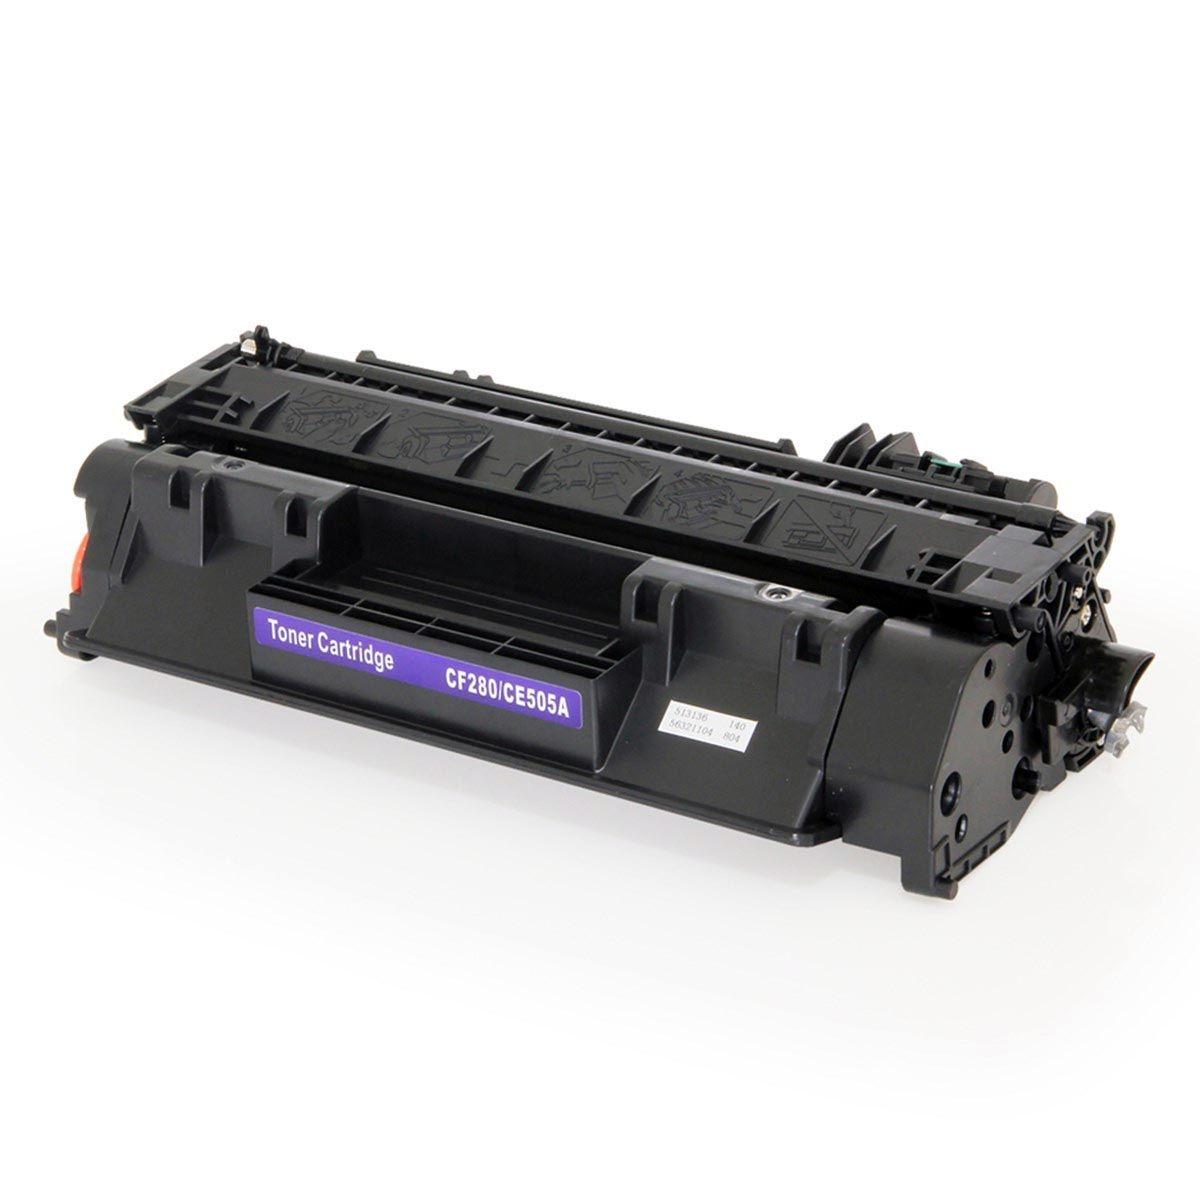 CARTUCHO HP (CE505A/CF280A) P2035/P2055/PRO 400 (COMPATÍVEL)